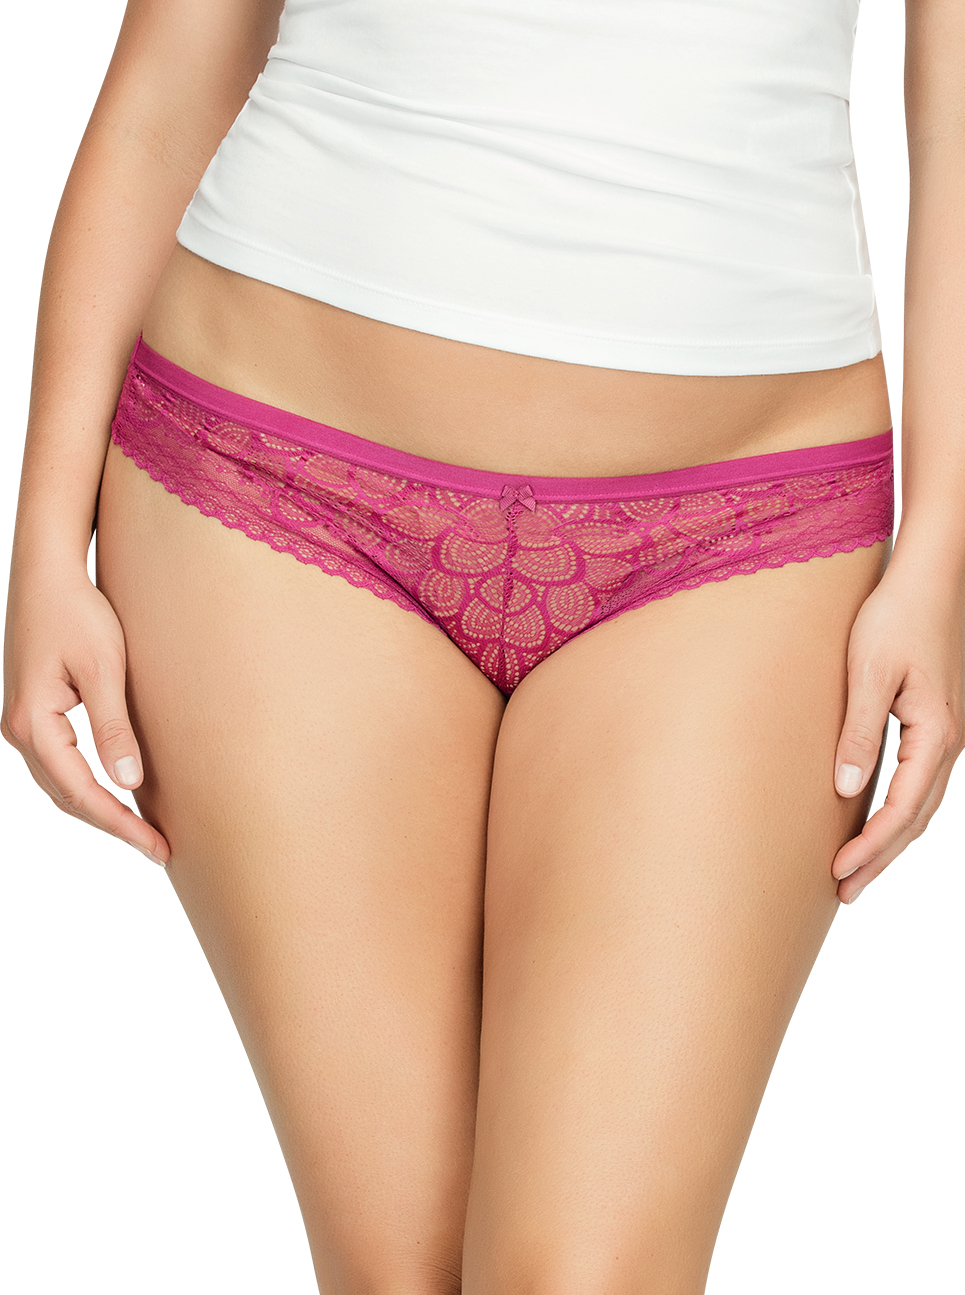 PARFAIT ParfaitPanty SoGlam ThongPP402 Raspberry Front1 - Panty So Glam Thong - Raspberry - PP402